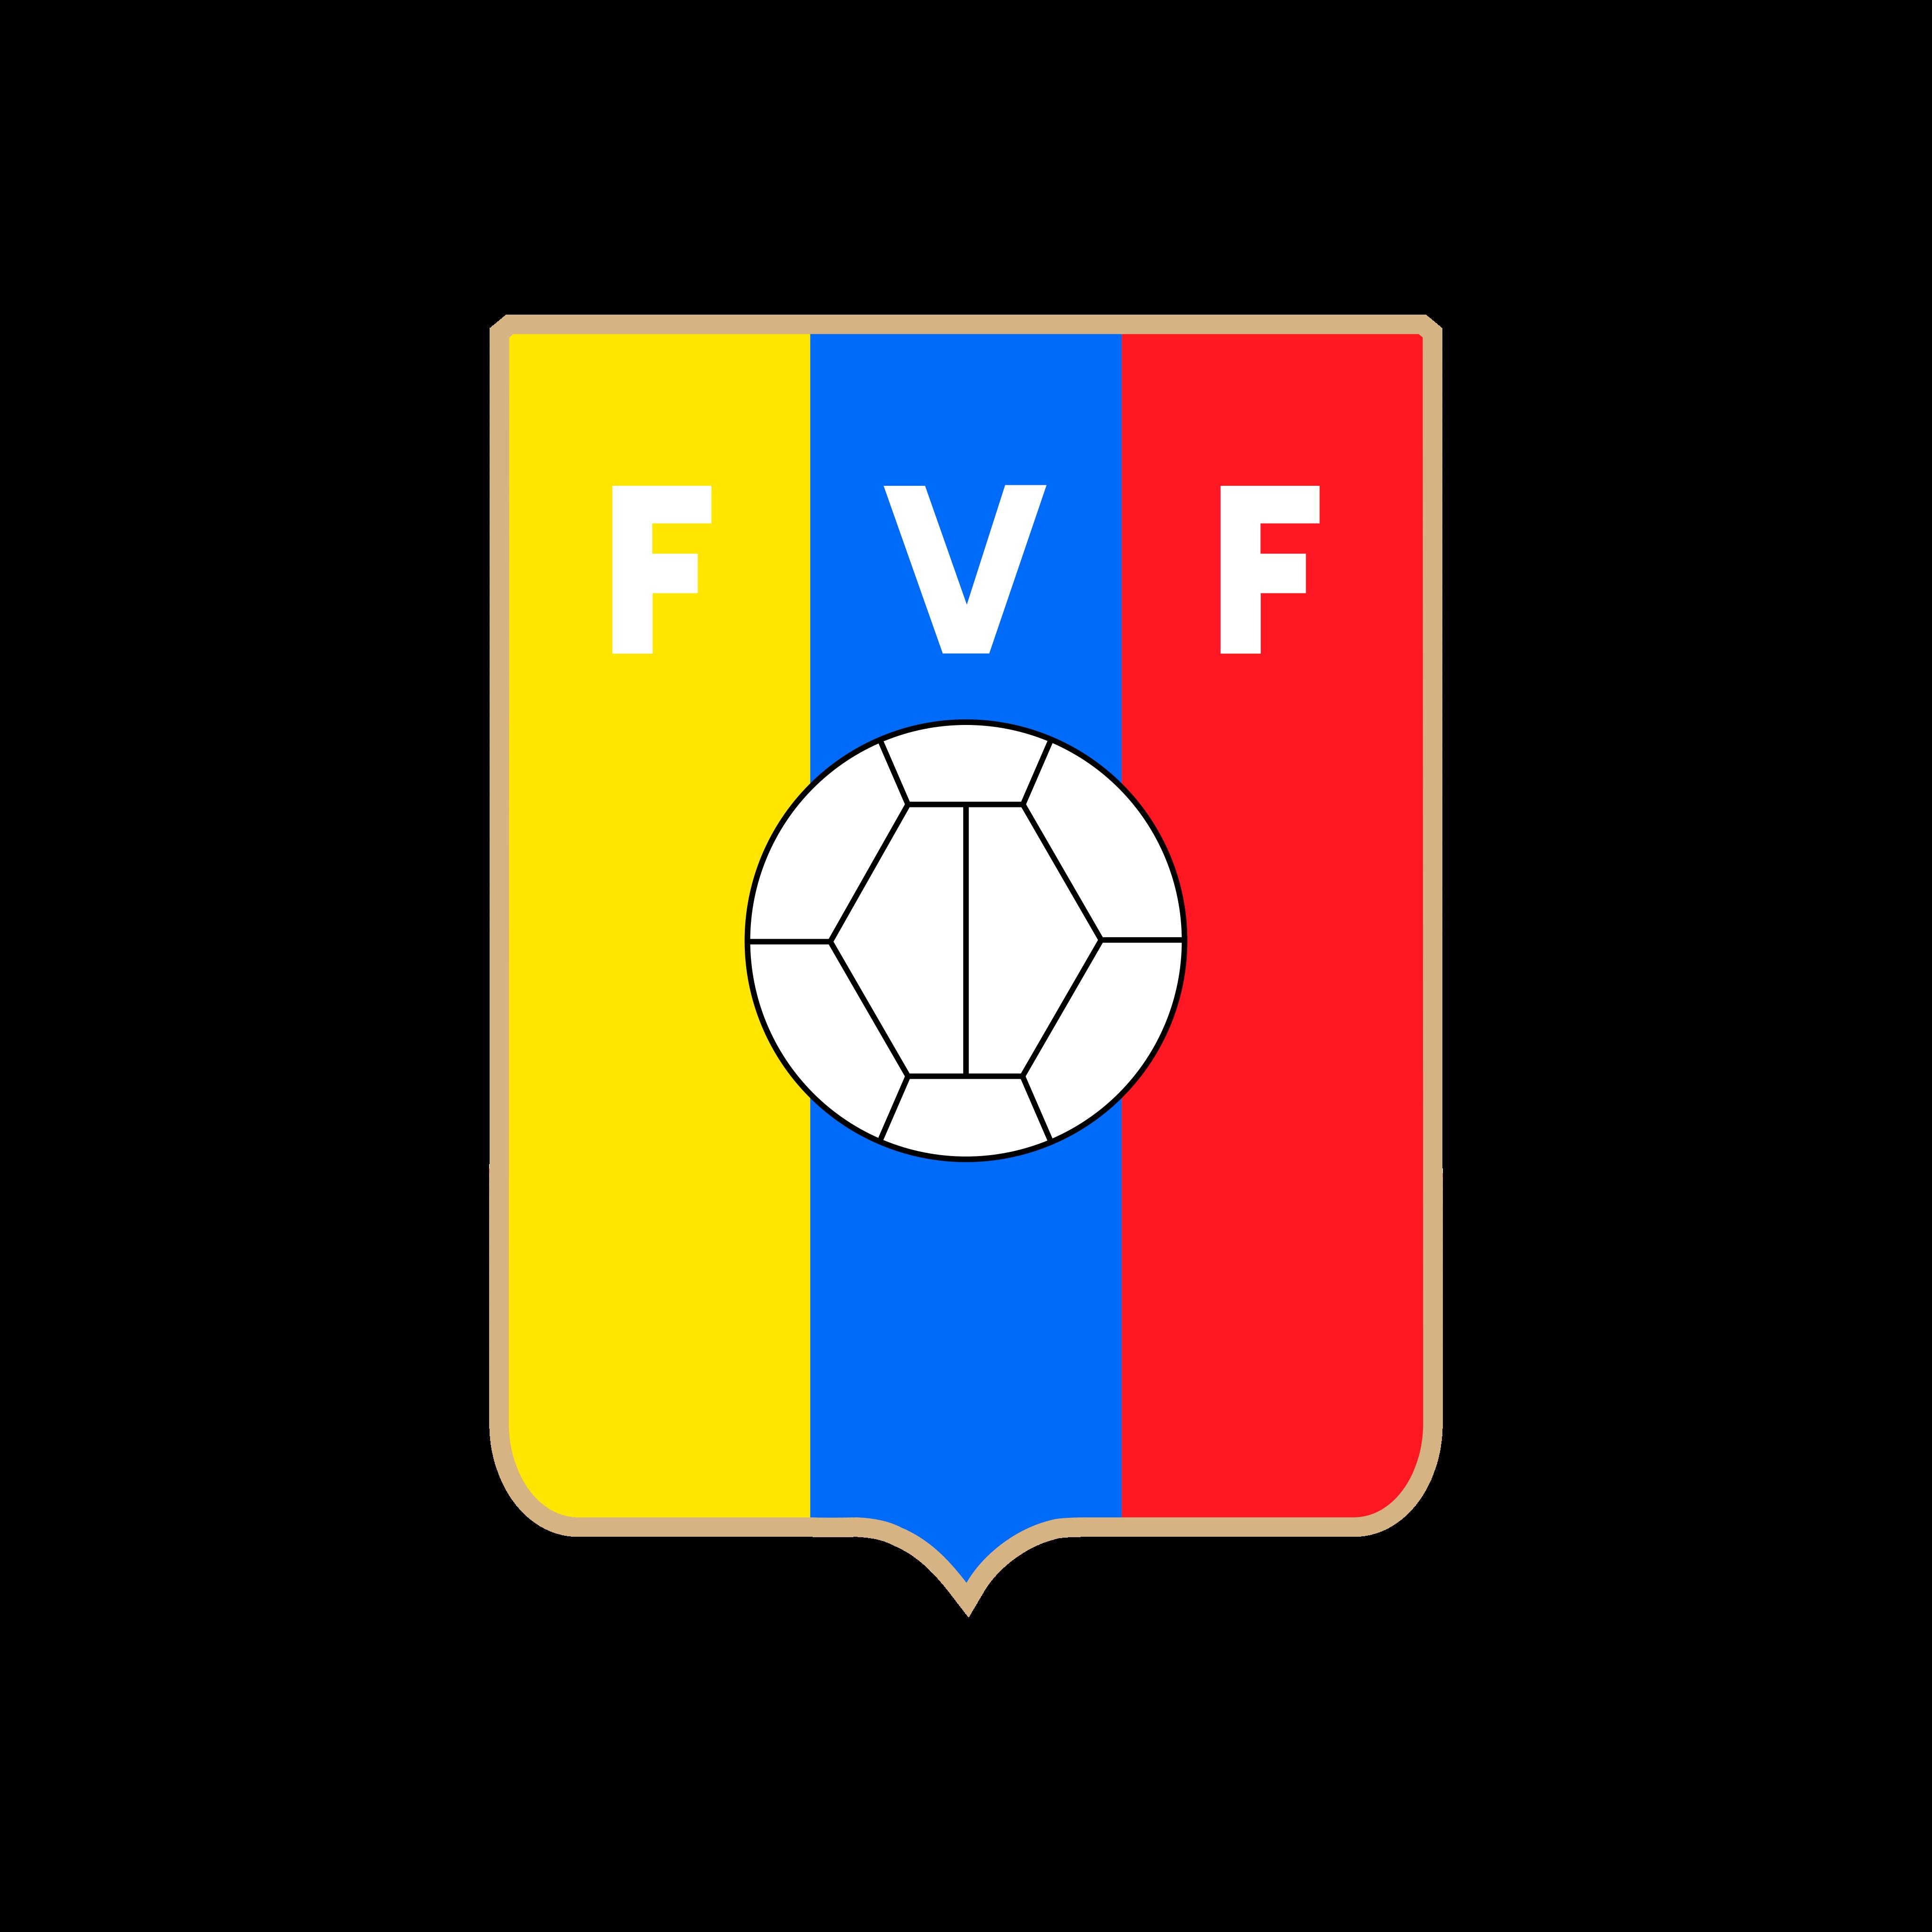 fvf seleccion de futbol de venezuela logo 0 - FVF Logo - Selección de fútbol de Venezuela Logo